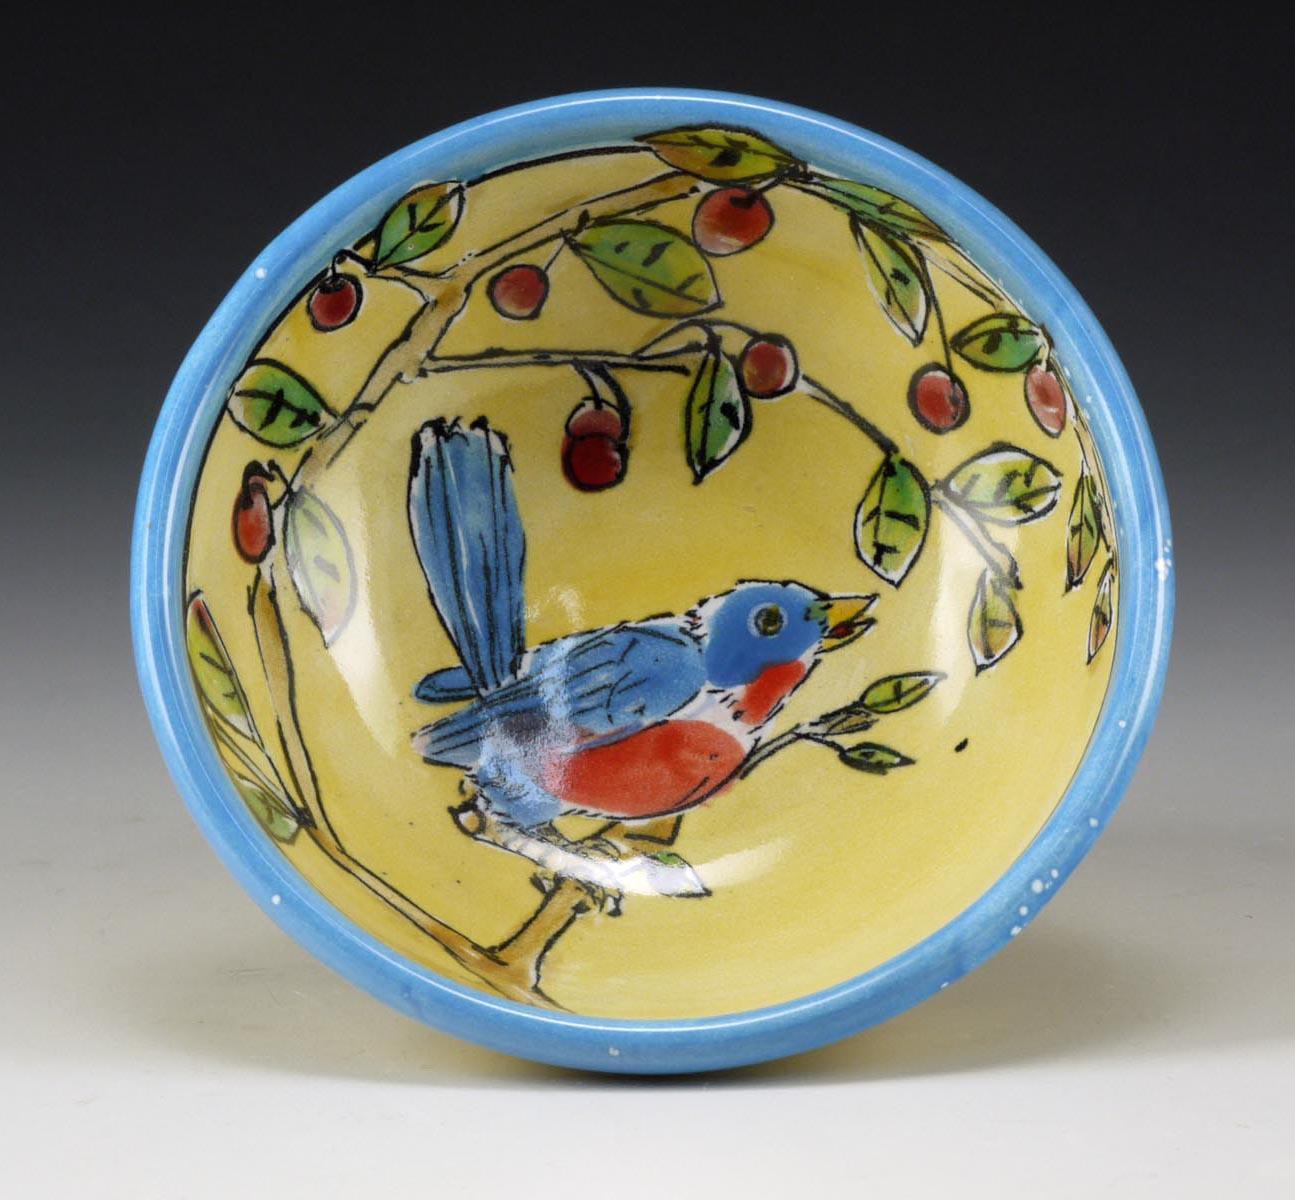 Arbuckle 2013 Condiment Bowl-Bluebird 521 (3PP).jpg